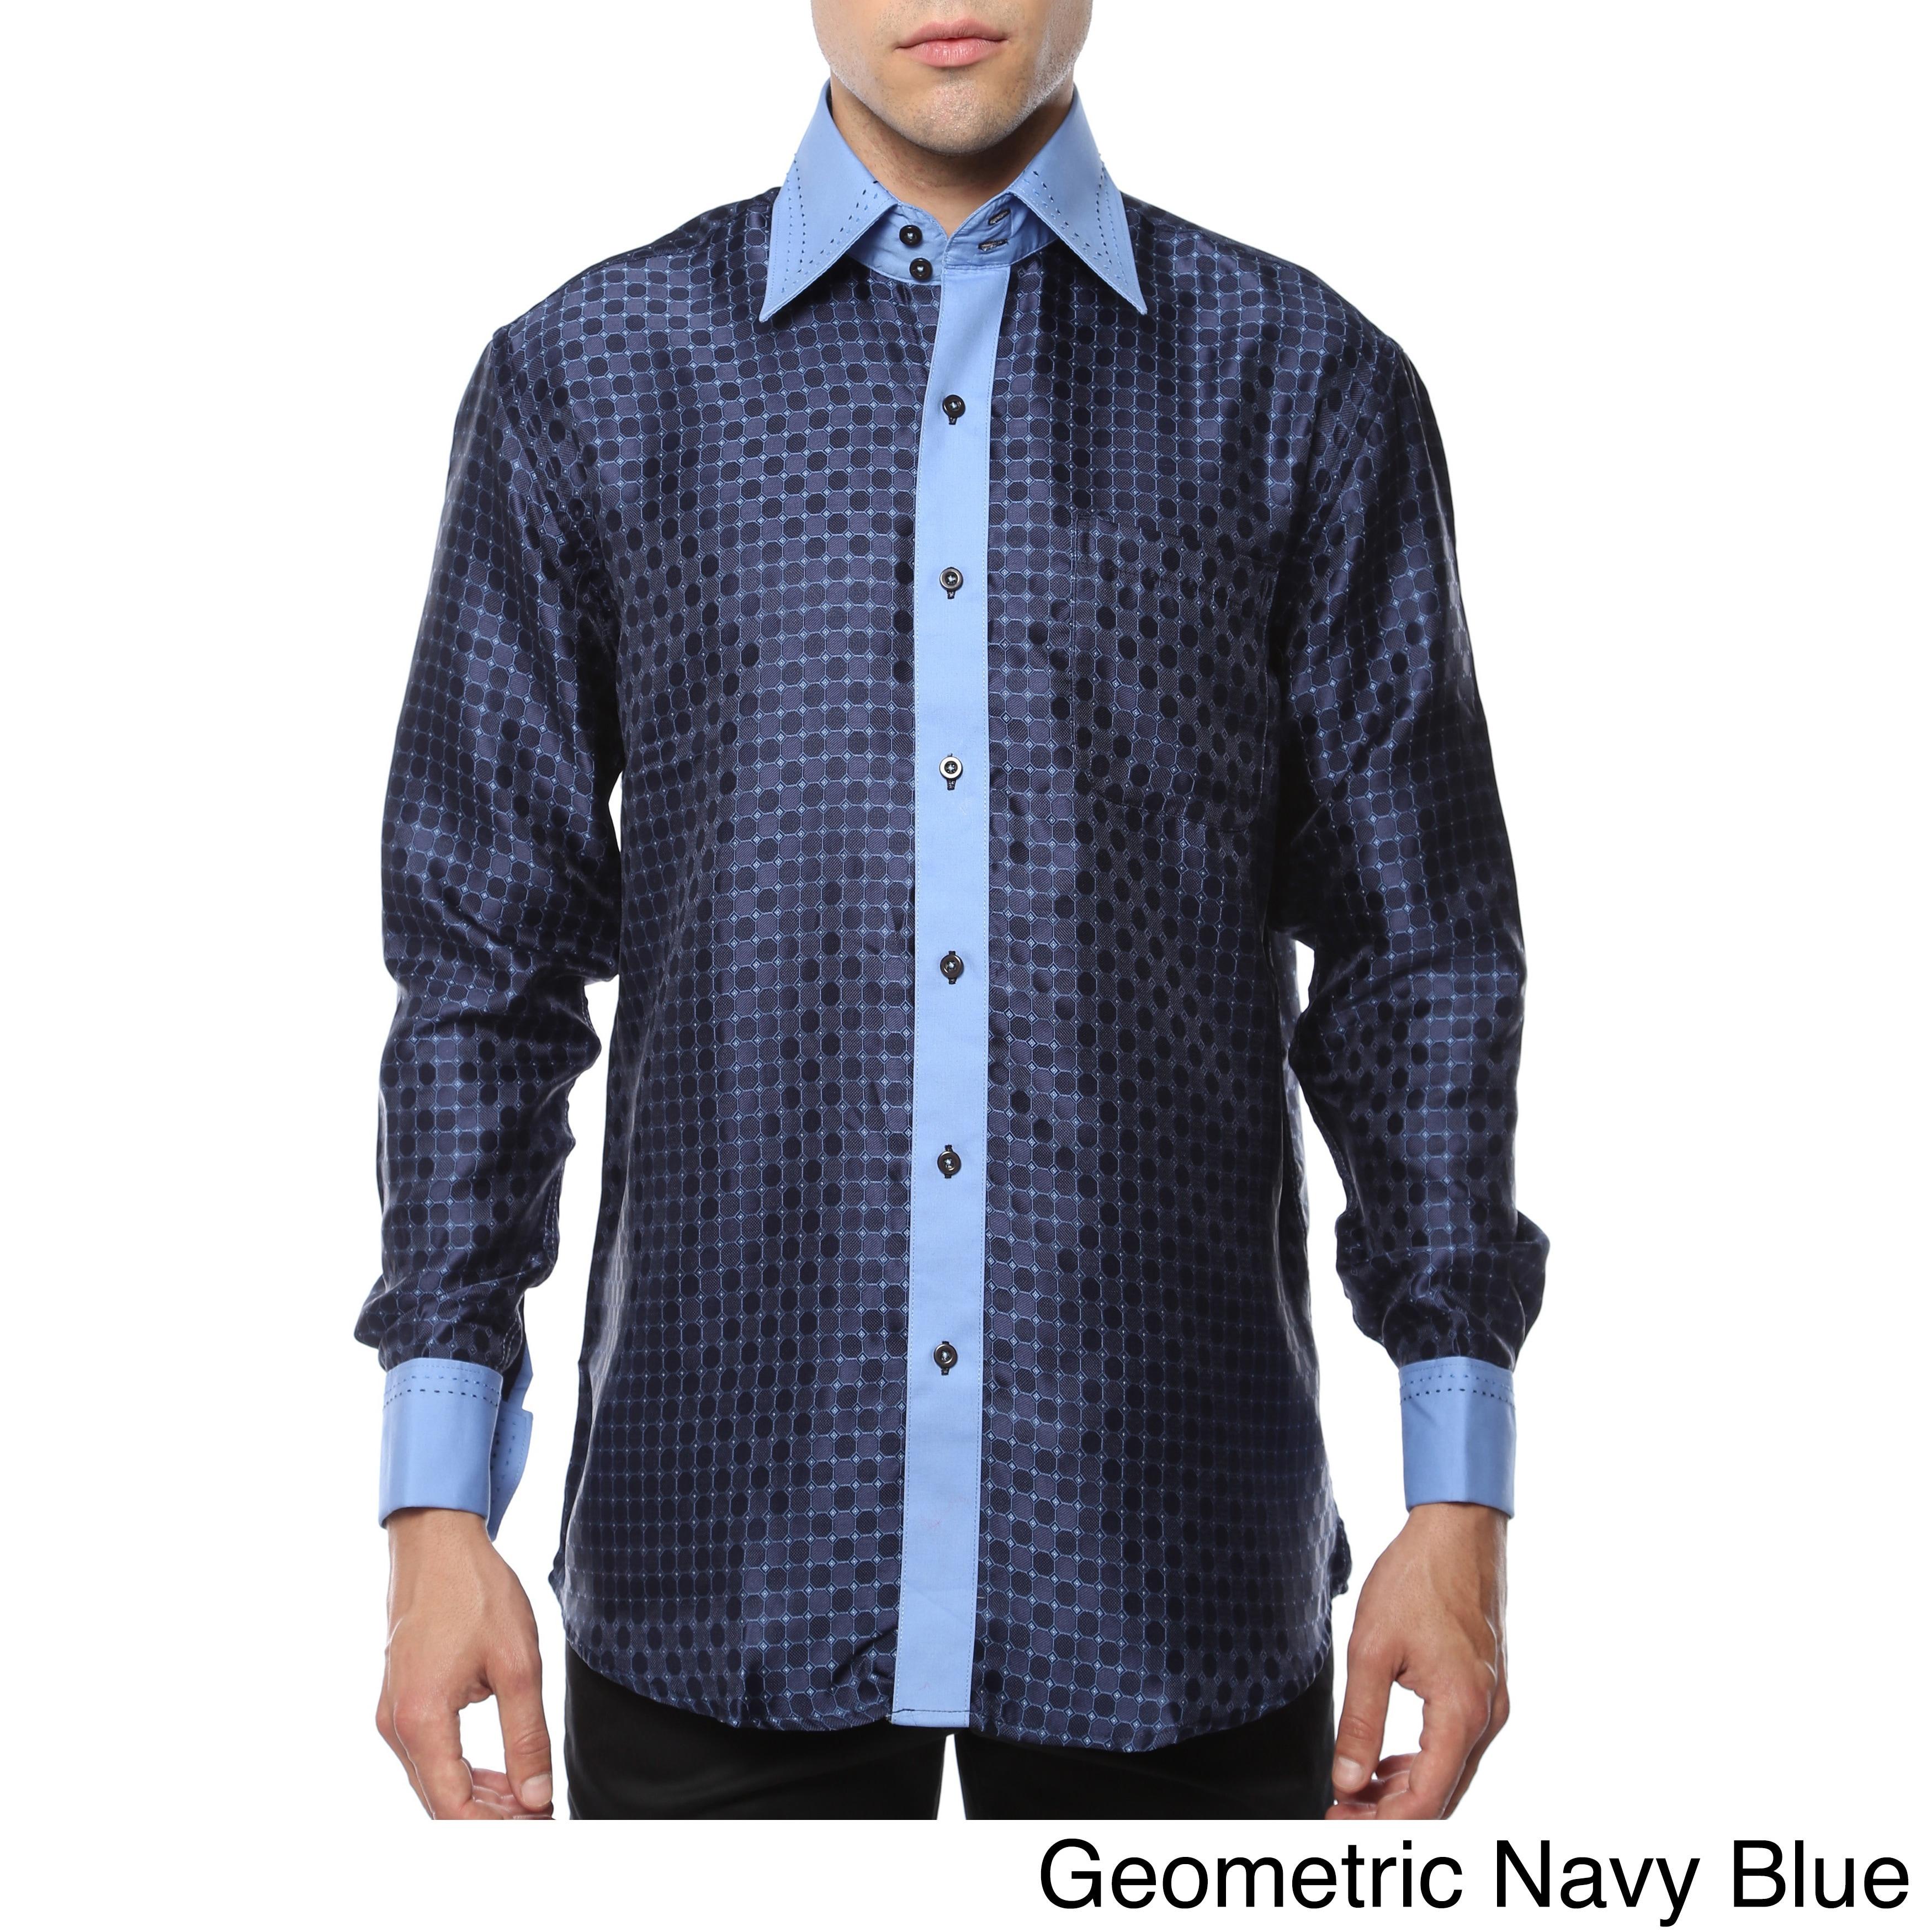 fa6b85af98b4b6 Shop Ferrecci Men s Satine Paisley or Geometric Satine Microfiber Dress  Shirt - Free Shipping On Orders Over  45 - Overstock - 11708138